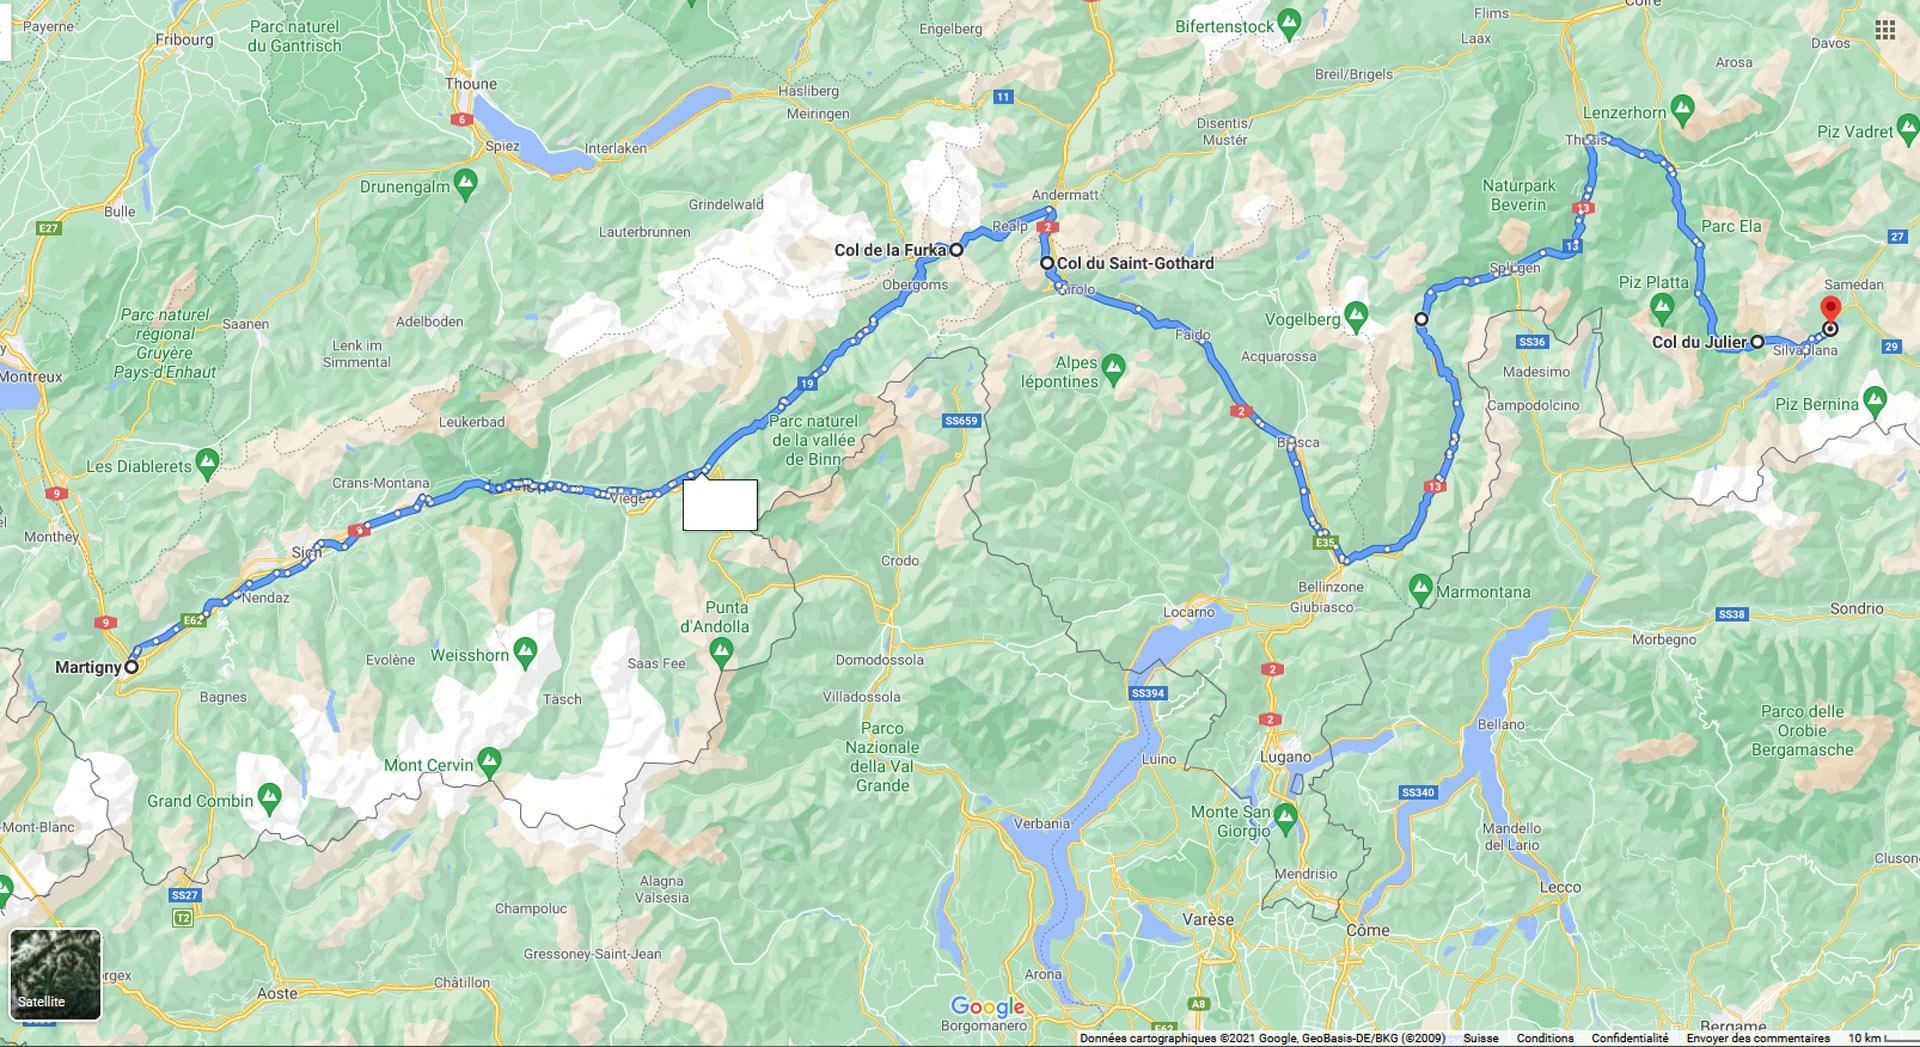 2021, swat, swiss alps tour, ascs